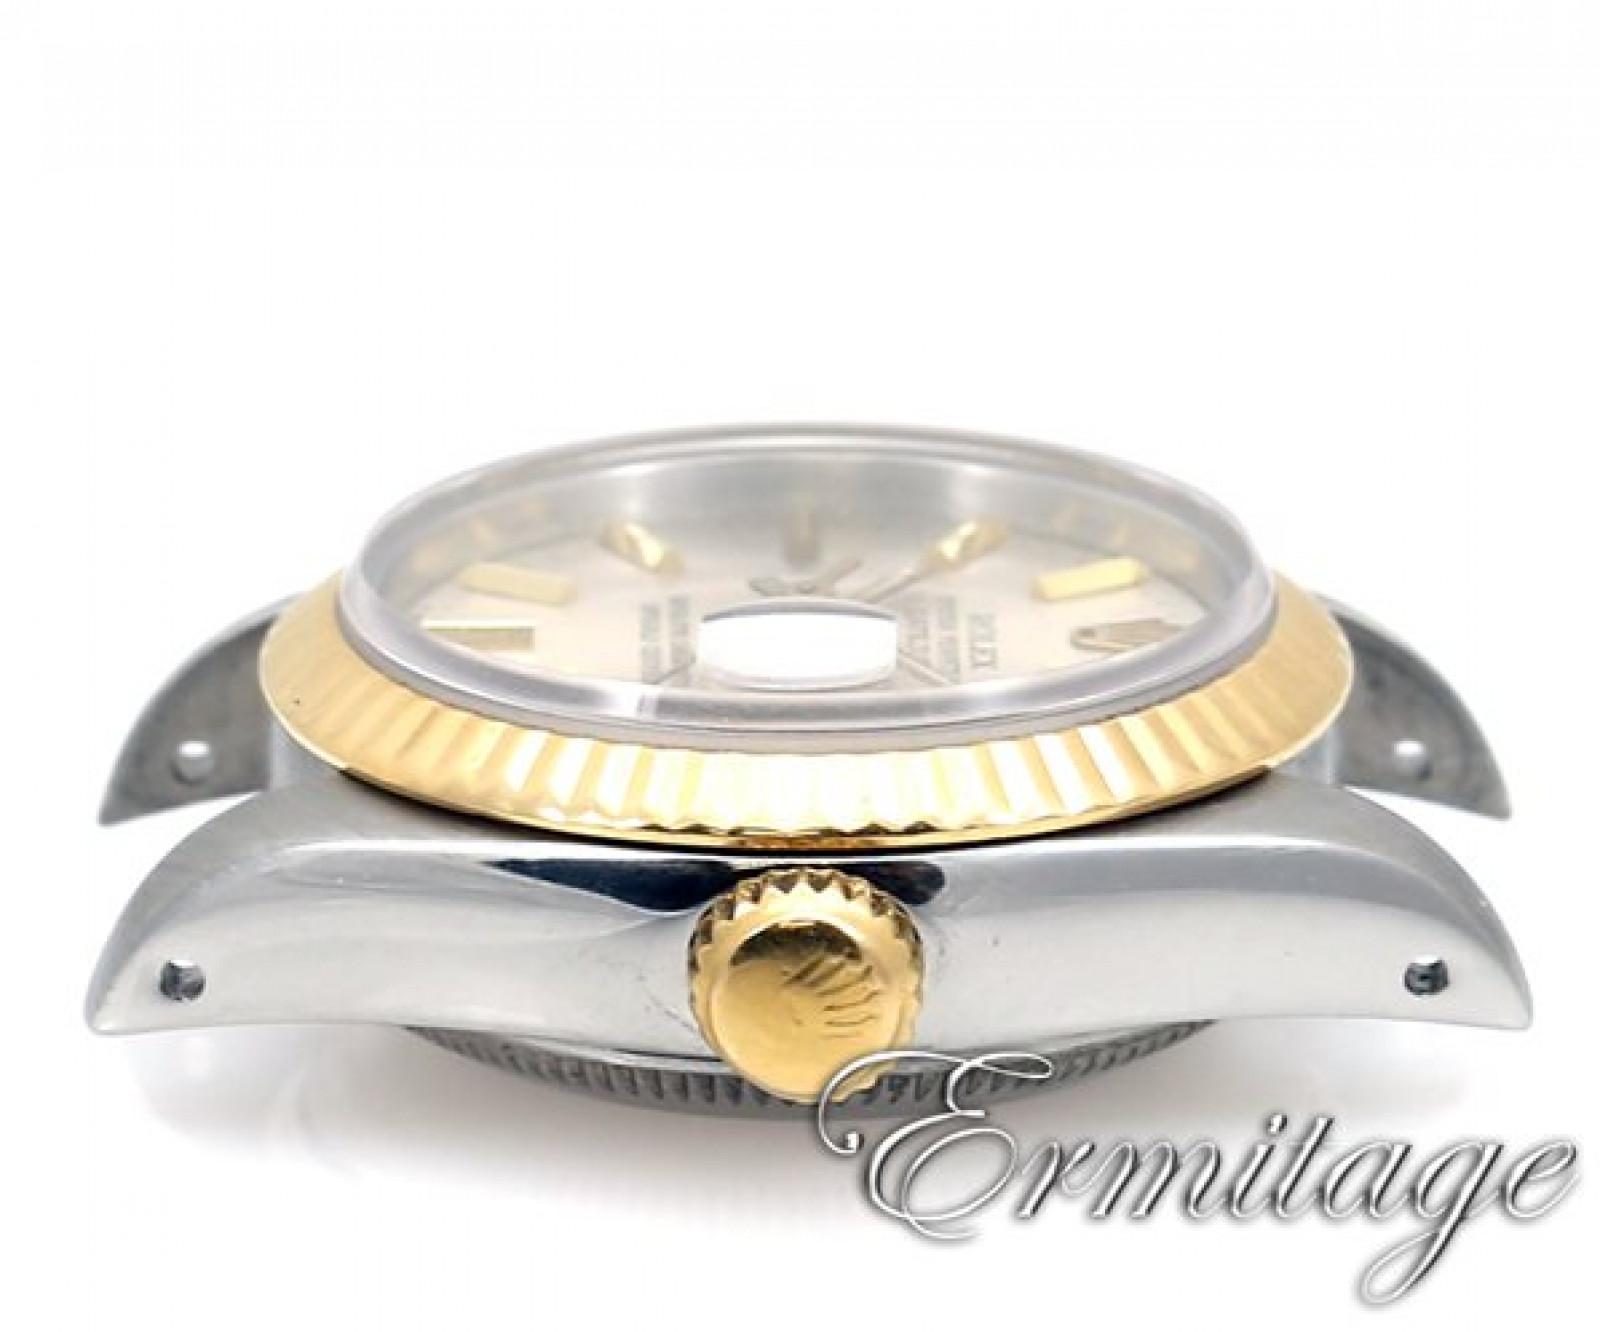 Ladies Rolex Datejust 69173 with Jubilee Bracelet